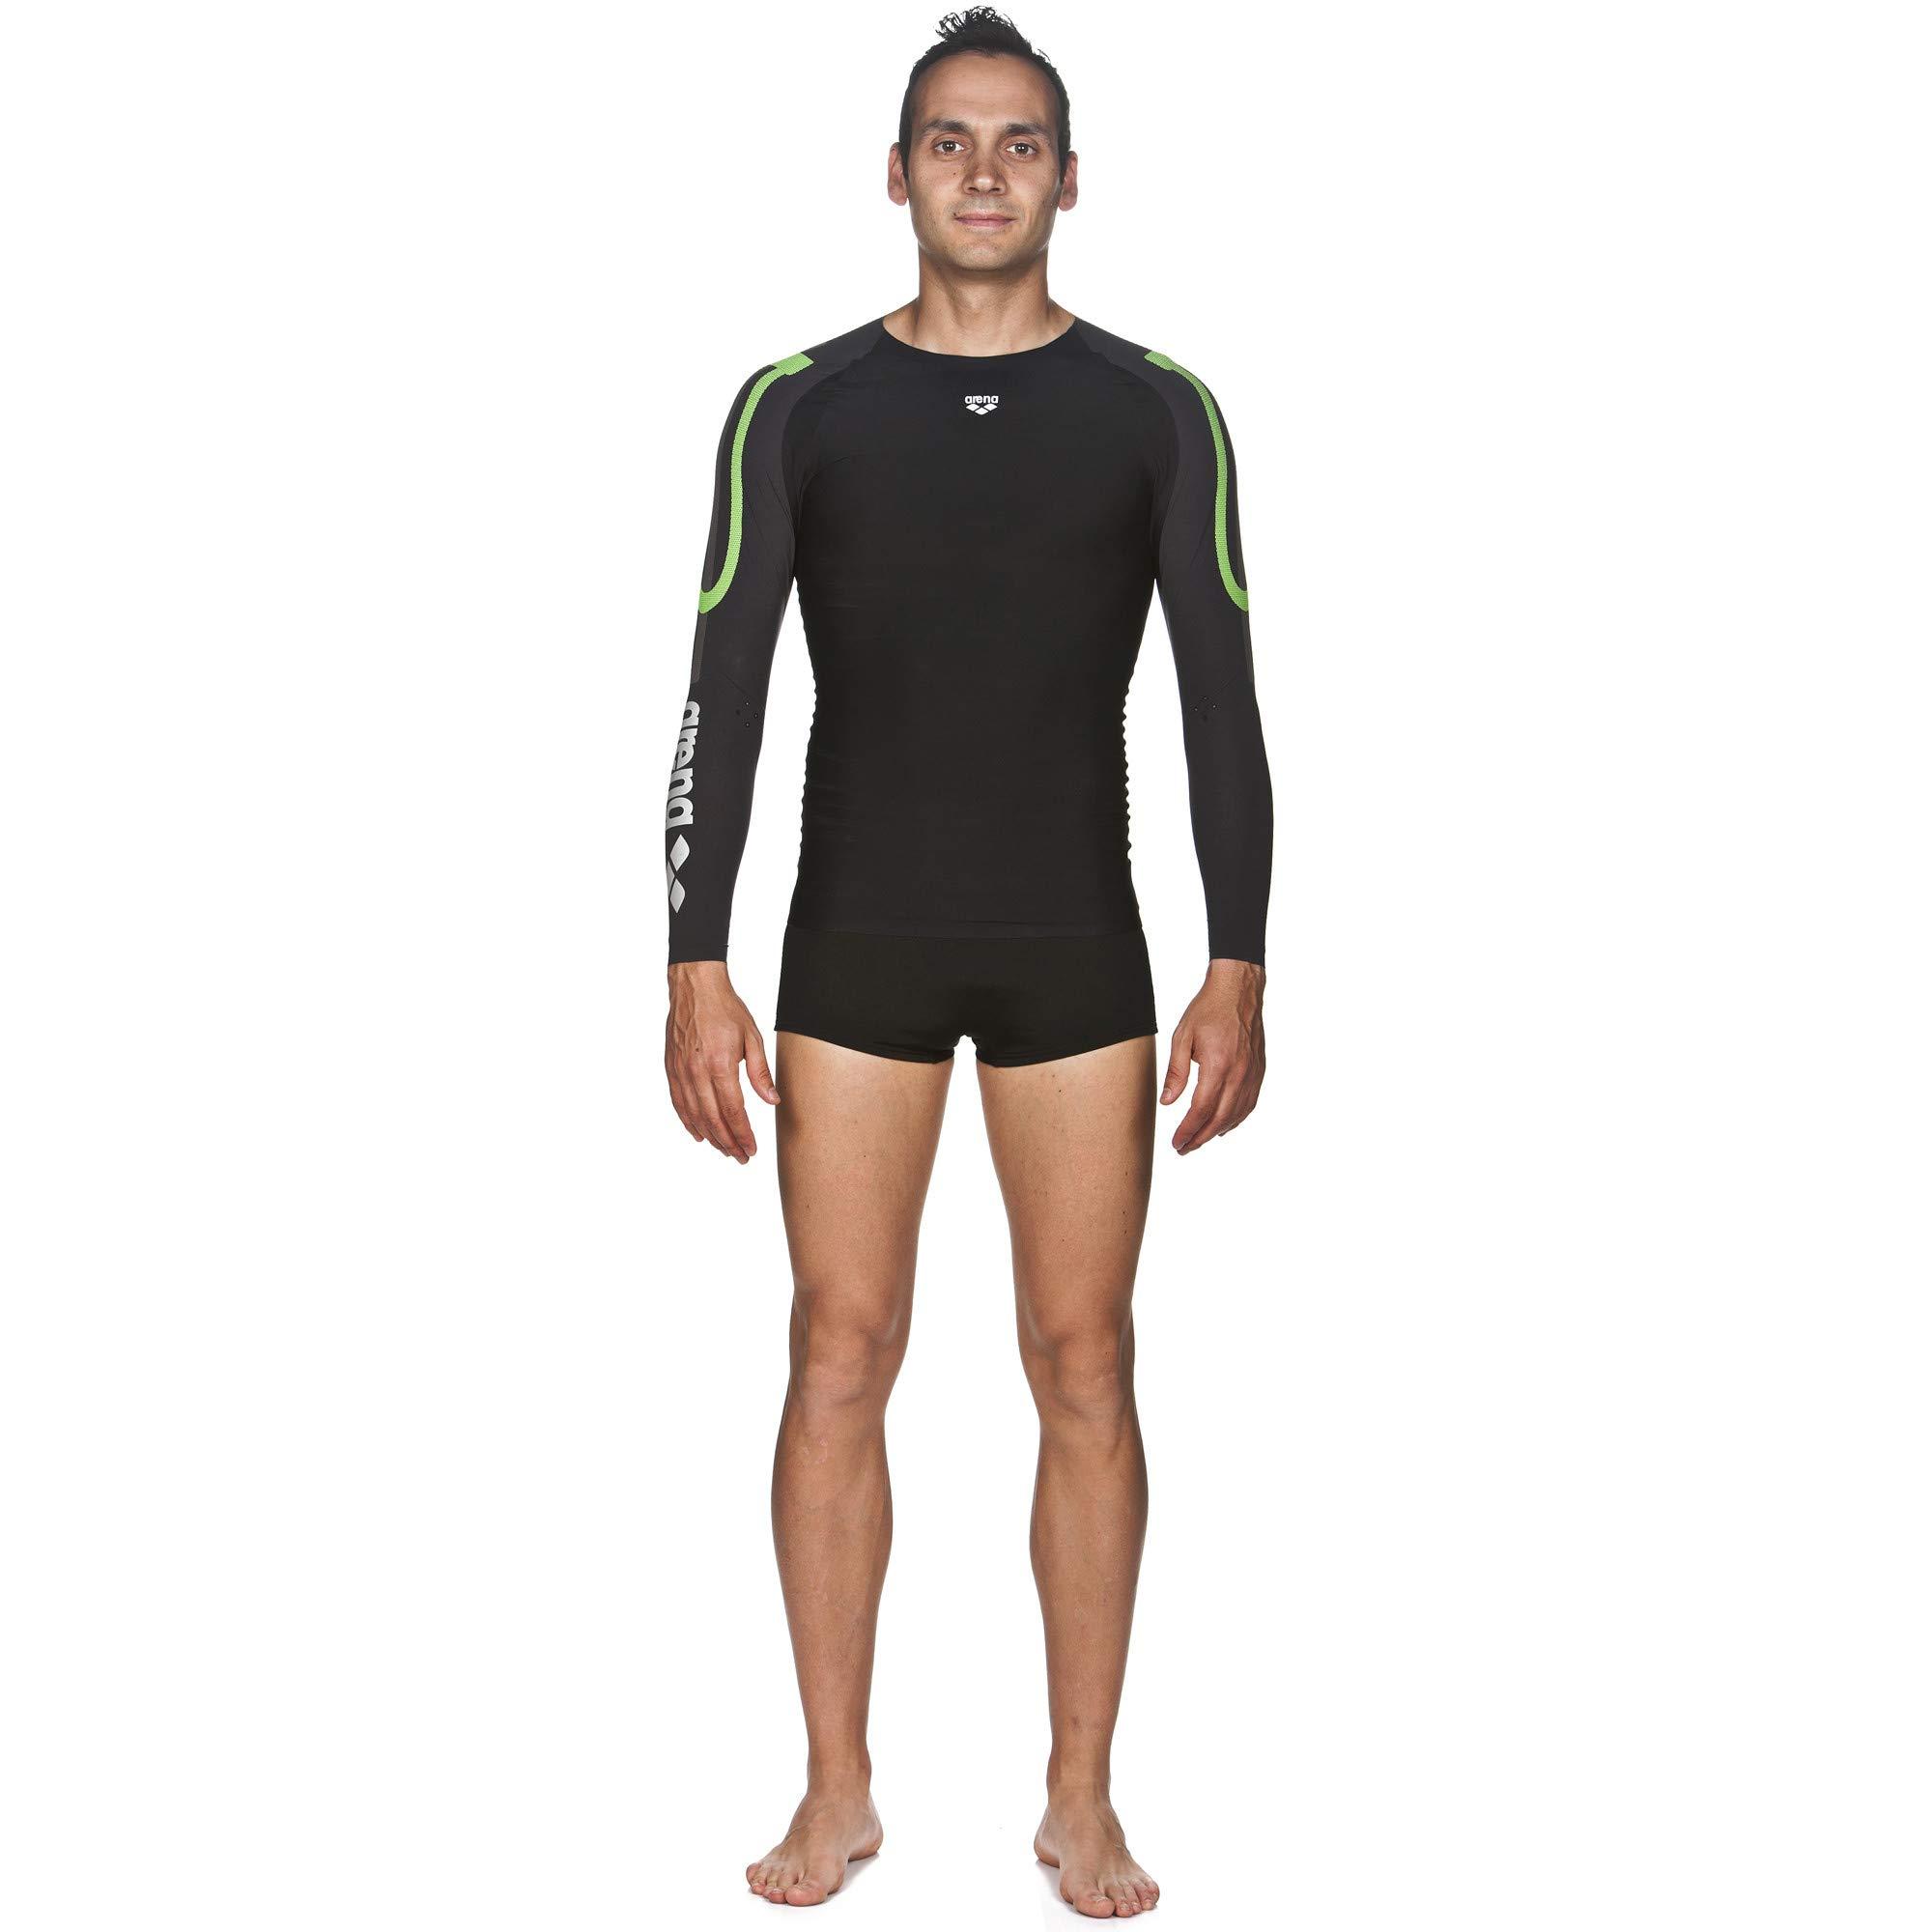 arena Herren Schwimm Kompressionsshirt Carbon Langarm (Atmungsaktiv, Carbon-Mate